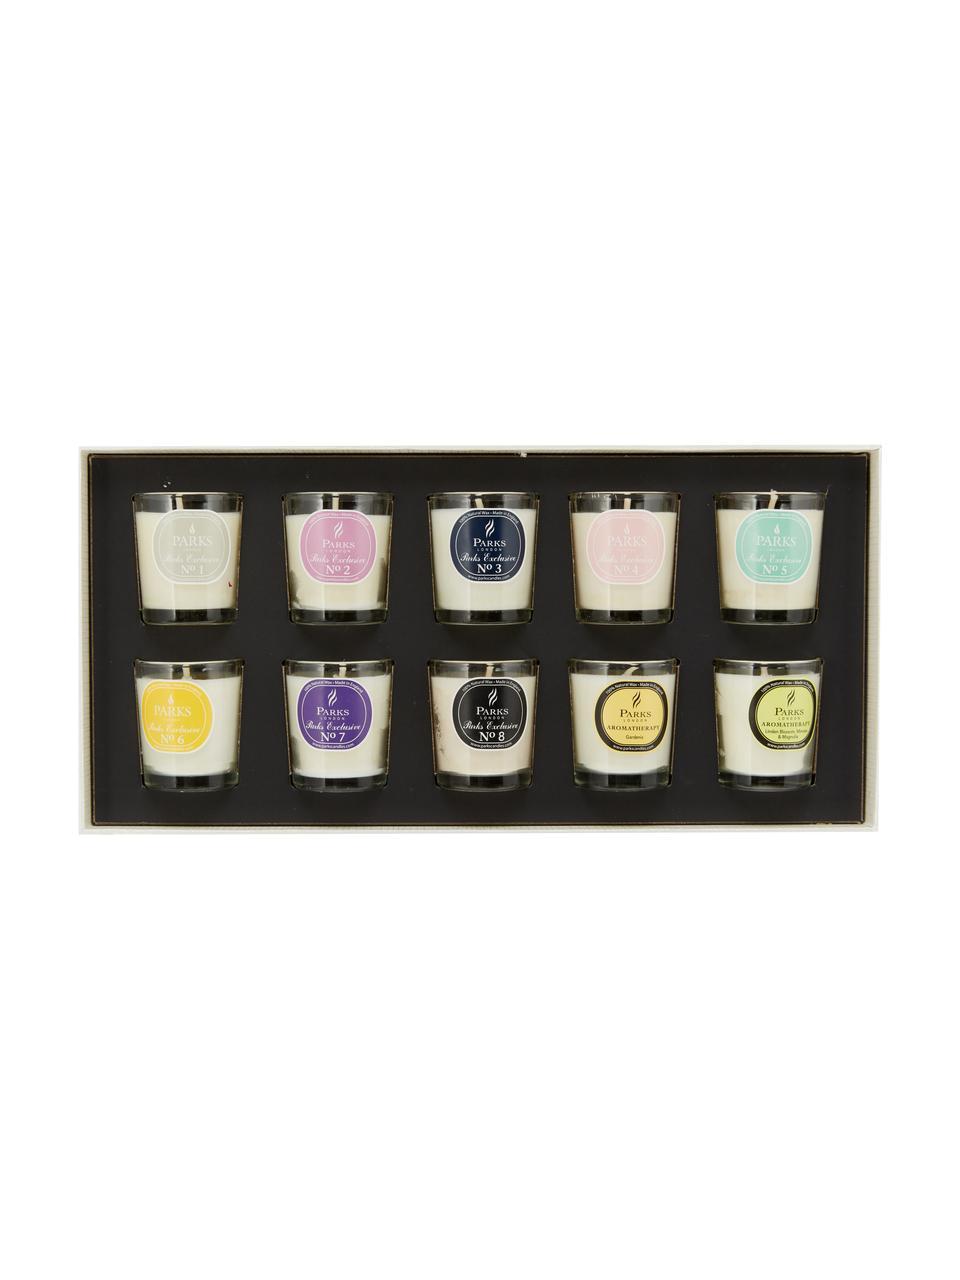 Set candele profumate Exclusive 10 pz, Contenitore: vetro, Multicolore, Ø 5 x Alt. 6 cm